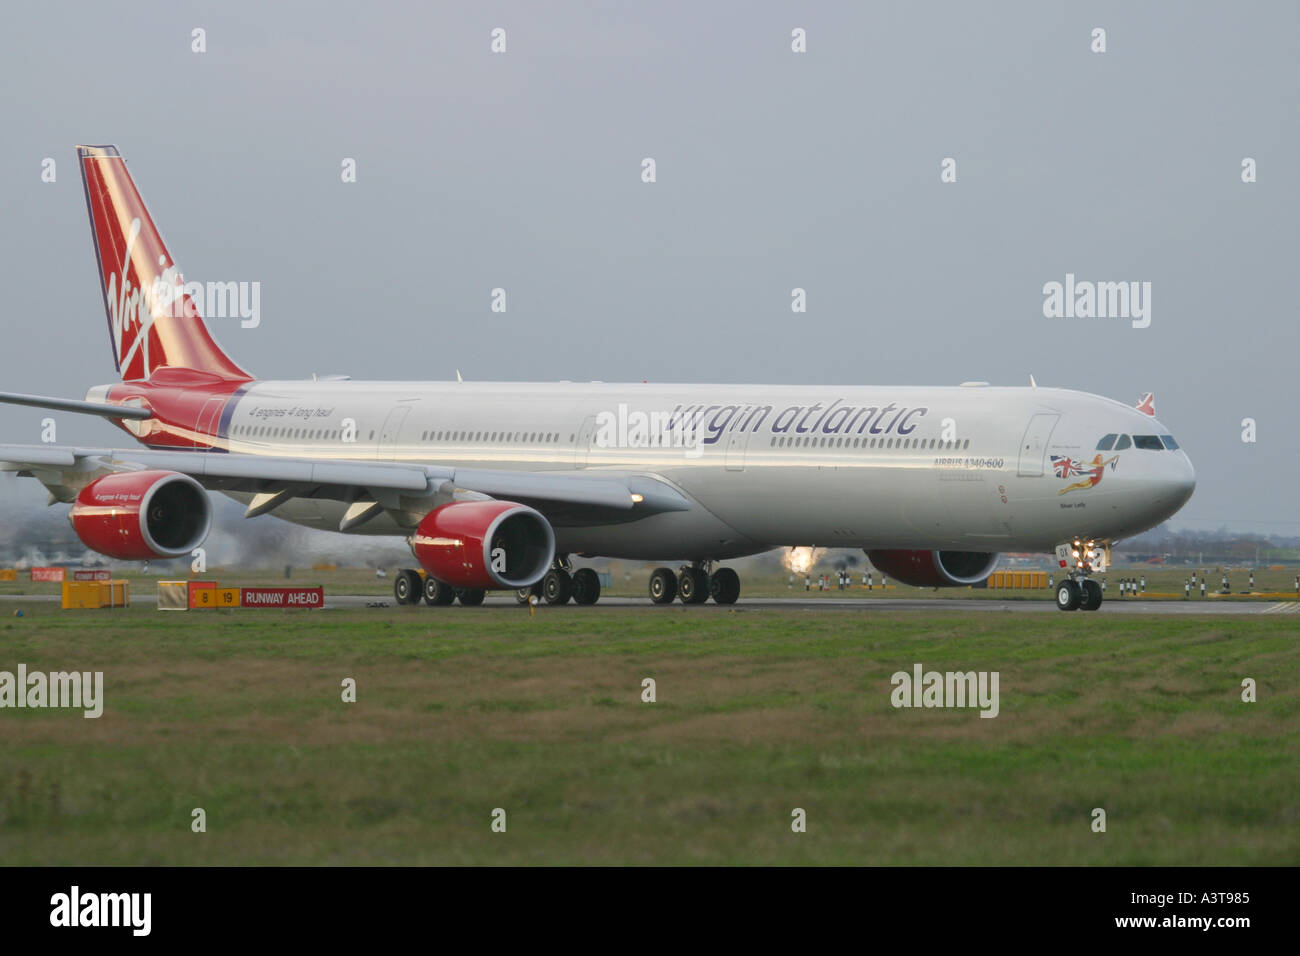 Commercial aircraft Airbus A340 642 Virgin Atlantic Airways preparing for departure at London Heathrow Airport - Stock Image